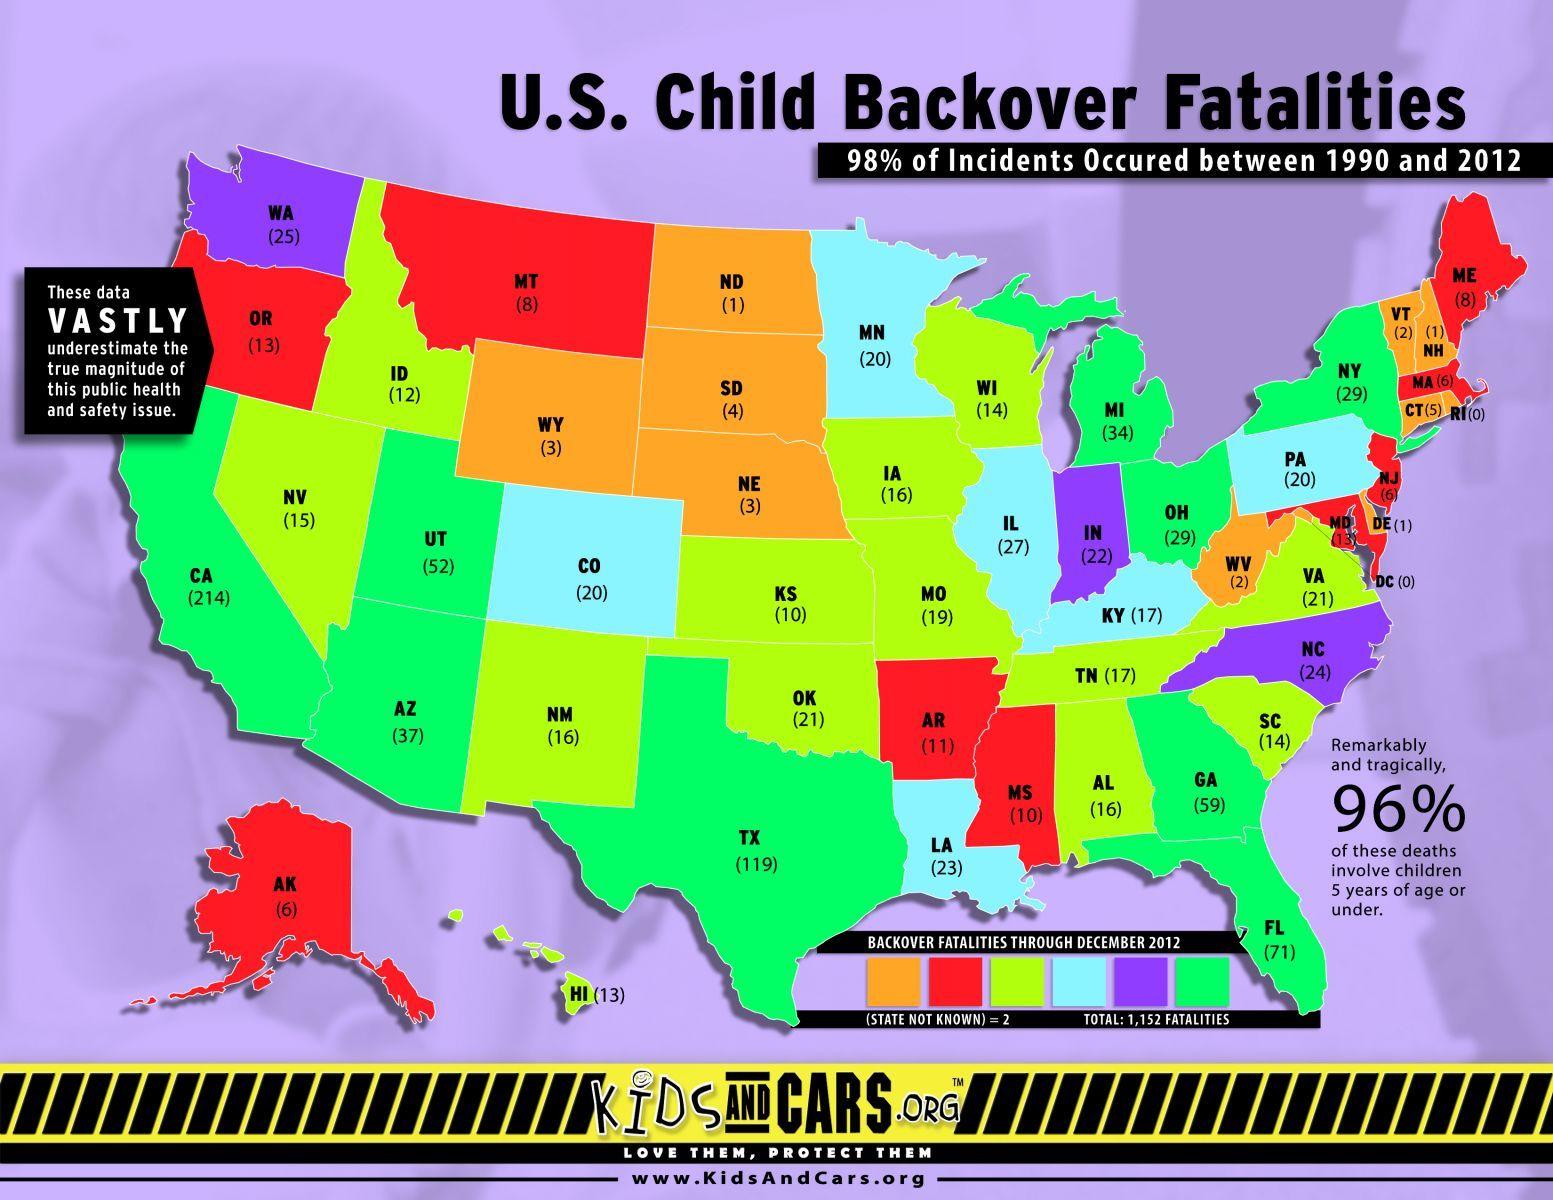 Child Backover Fatalities Parenting, Children, Child safety